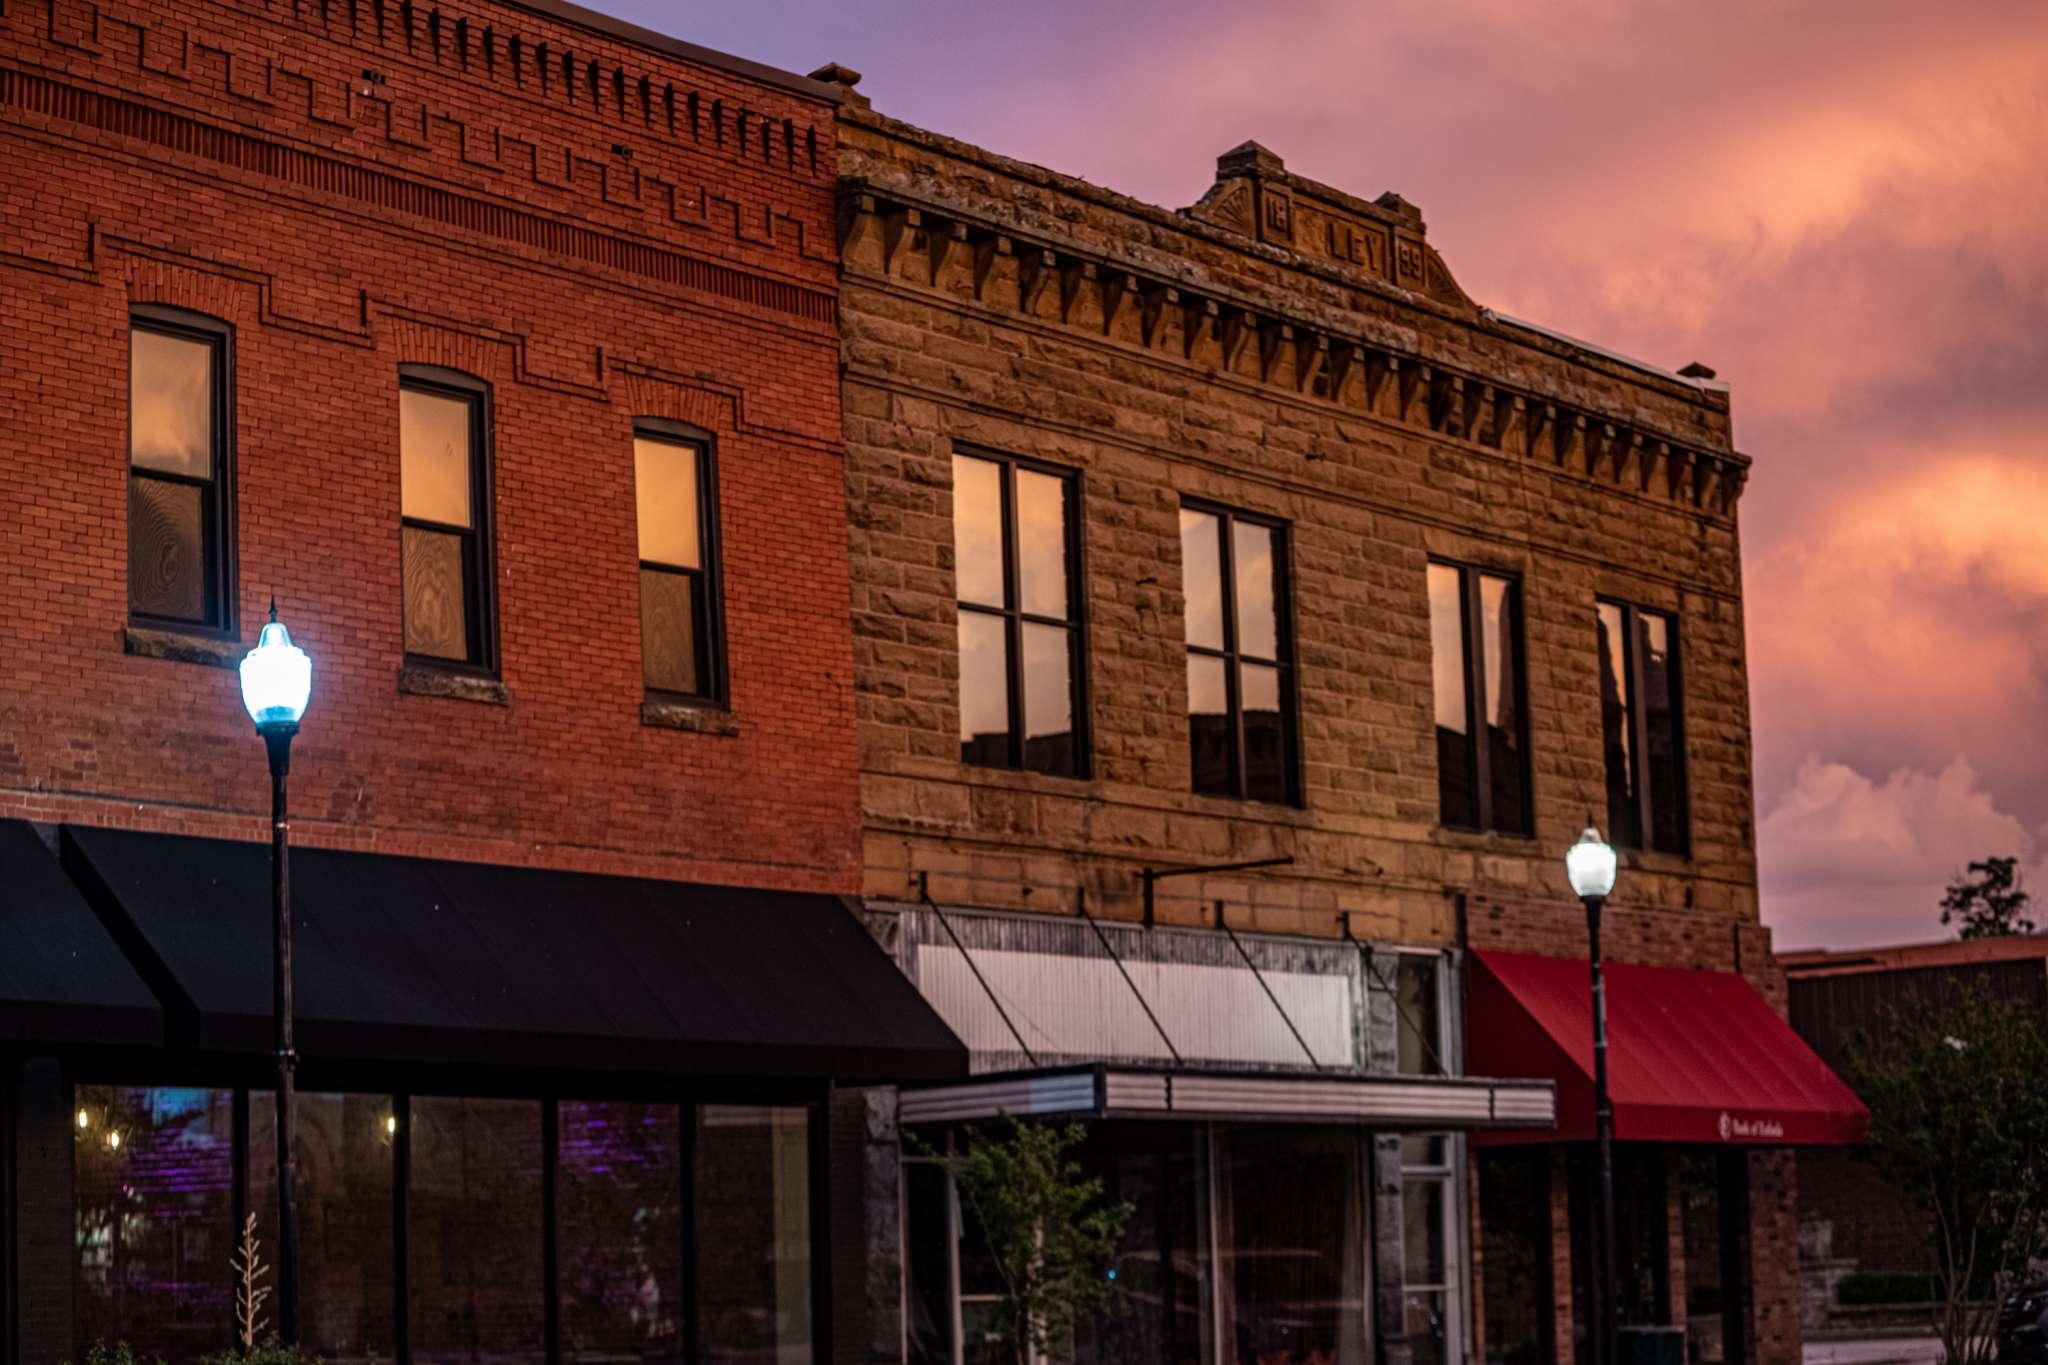 Historic downtown Eufaula, Oklahoma